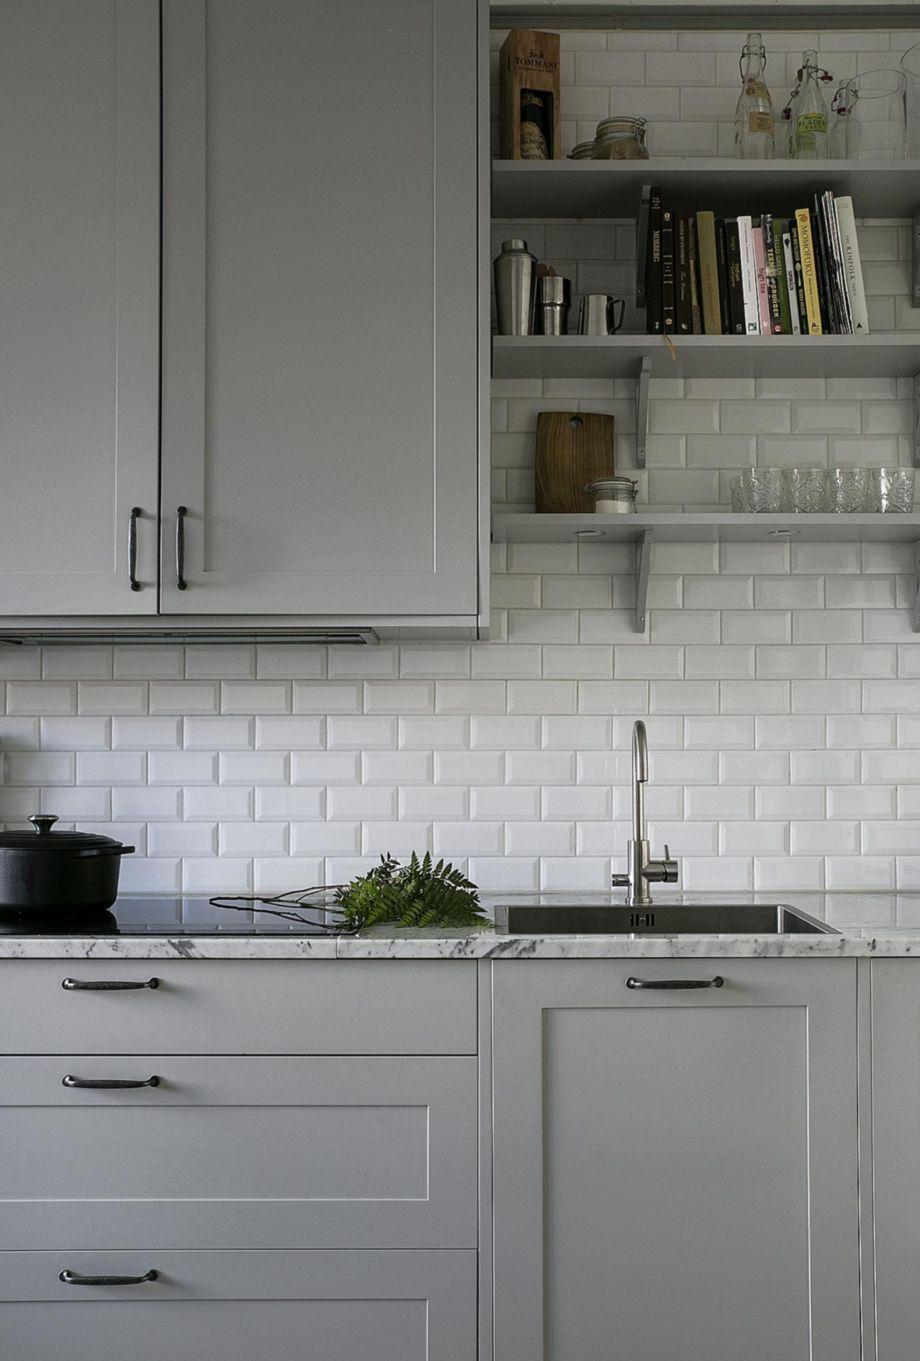 77 Cool Grey Kitchen Cabinet Ideas Http Homecemoro Com 77 Cool Grey Kitchen Cabinet Ideas Grey Kitchen Designs Kitchen Cabinet Design Kitchen Renovation